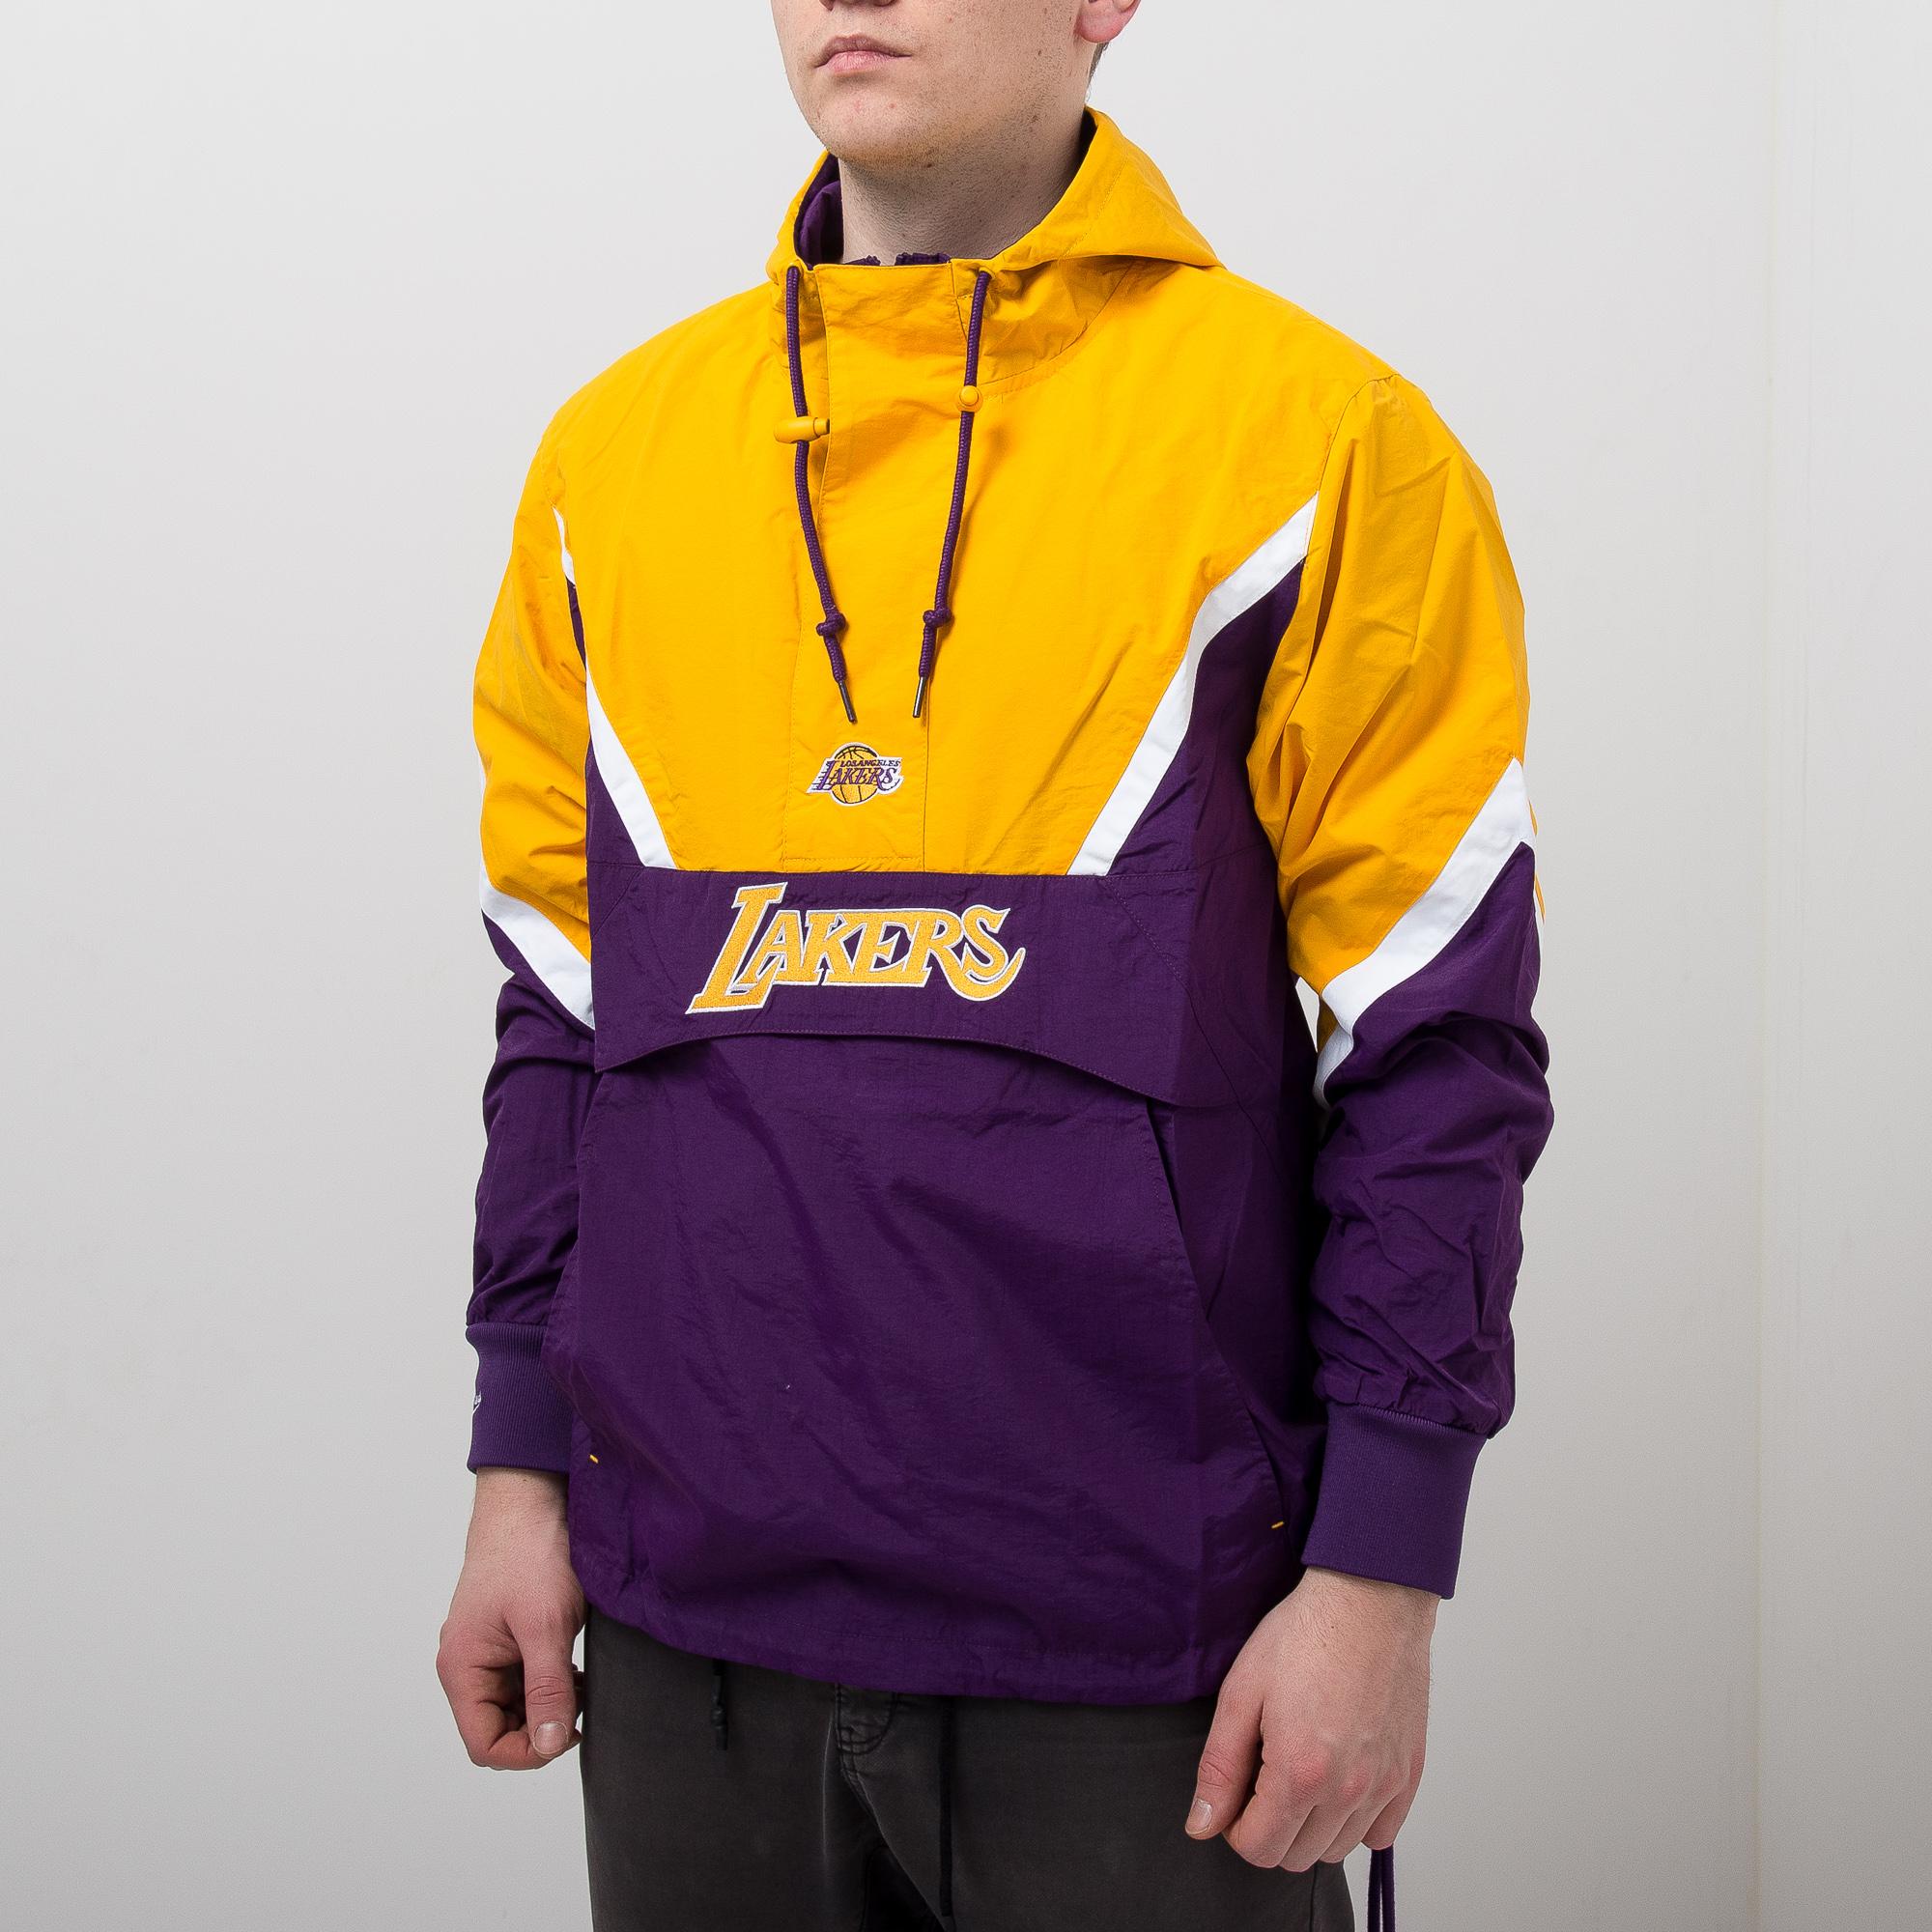 76b3cb7f741 Mitchell & Ness NBA Los Angeles Lakers Half Zip Anorak Jacket - NBA Shop  Los Angeles Lakers Merchandise - Superfanas.lt